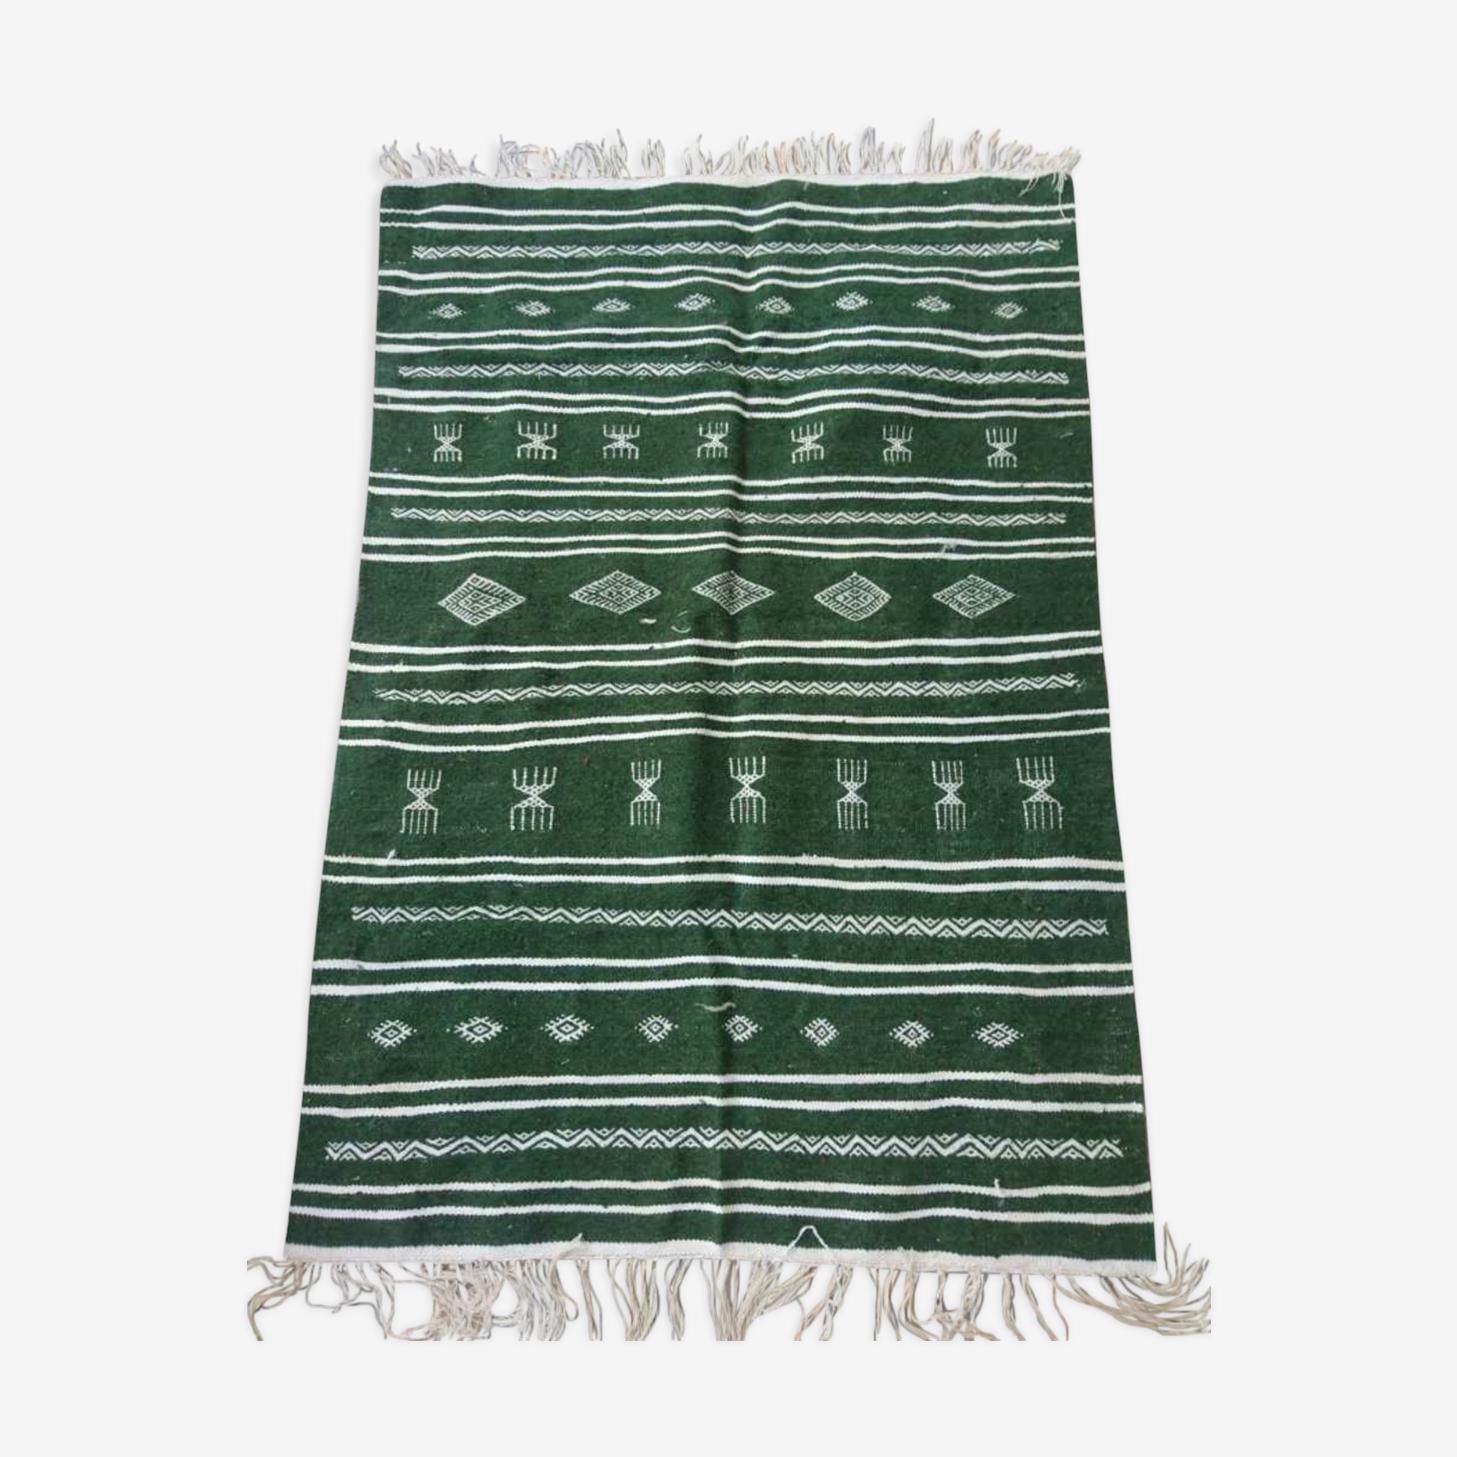 Carpet Kilim green and white 95x145cm